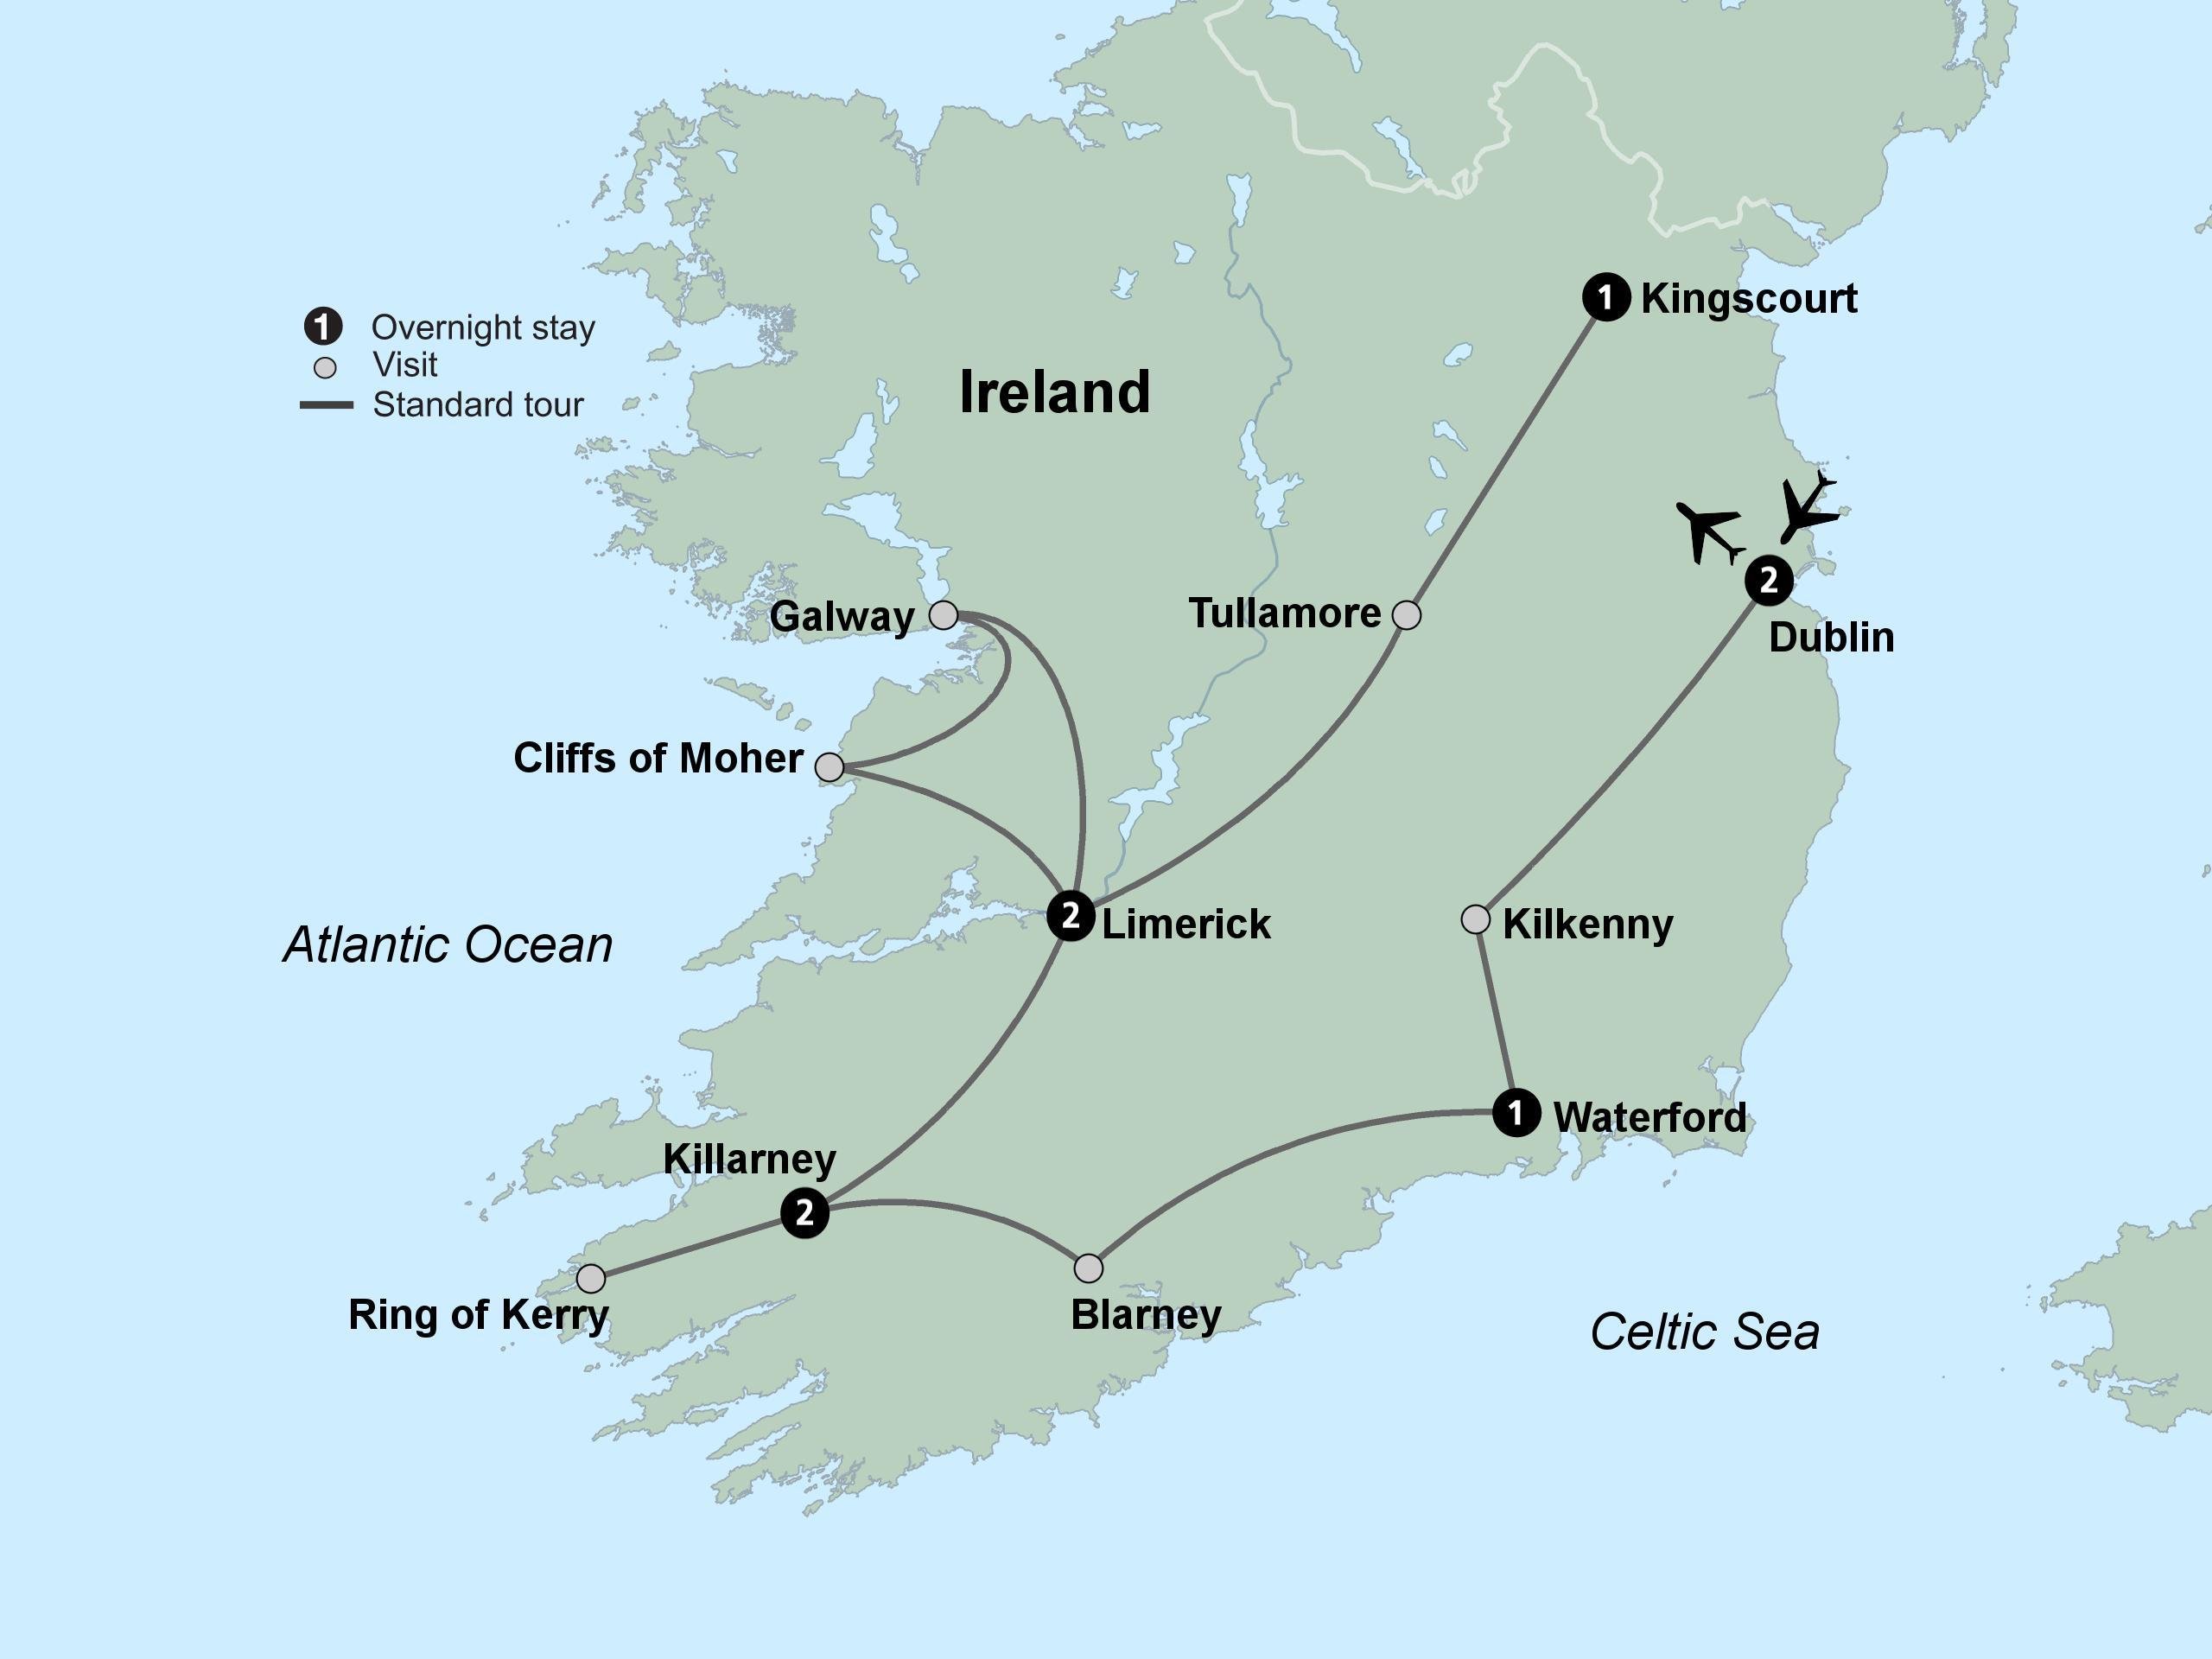 Europa Meridionale Cartina.Mappa Turistica Dell Irlanda Meridionale Mappa Di Mappa Turistica Dell Irlanda Del Sud Europa Del Nord Europa